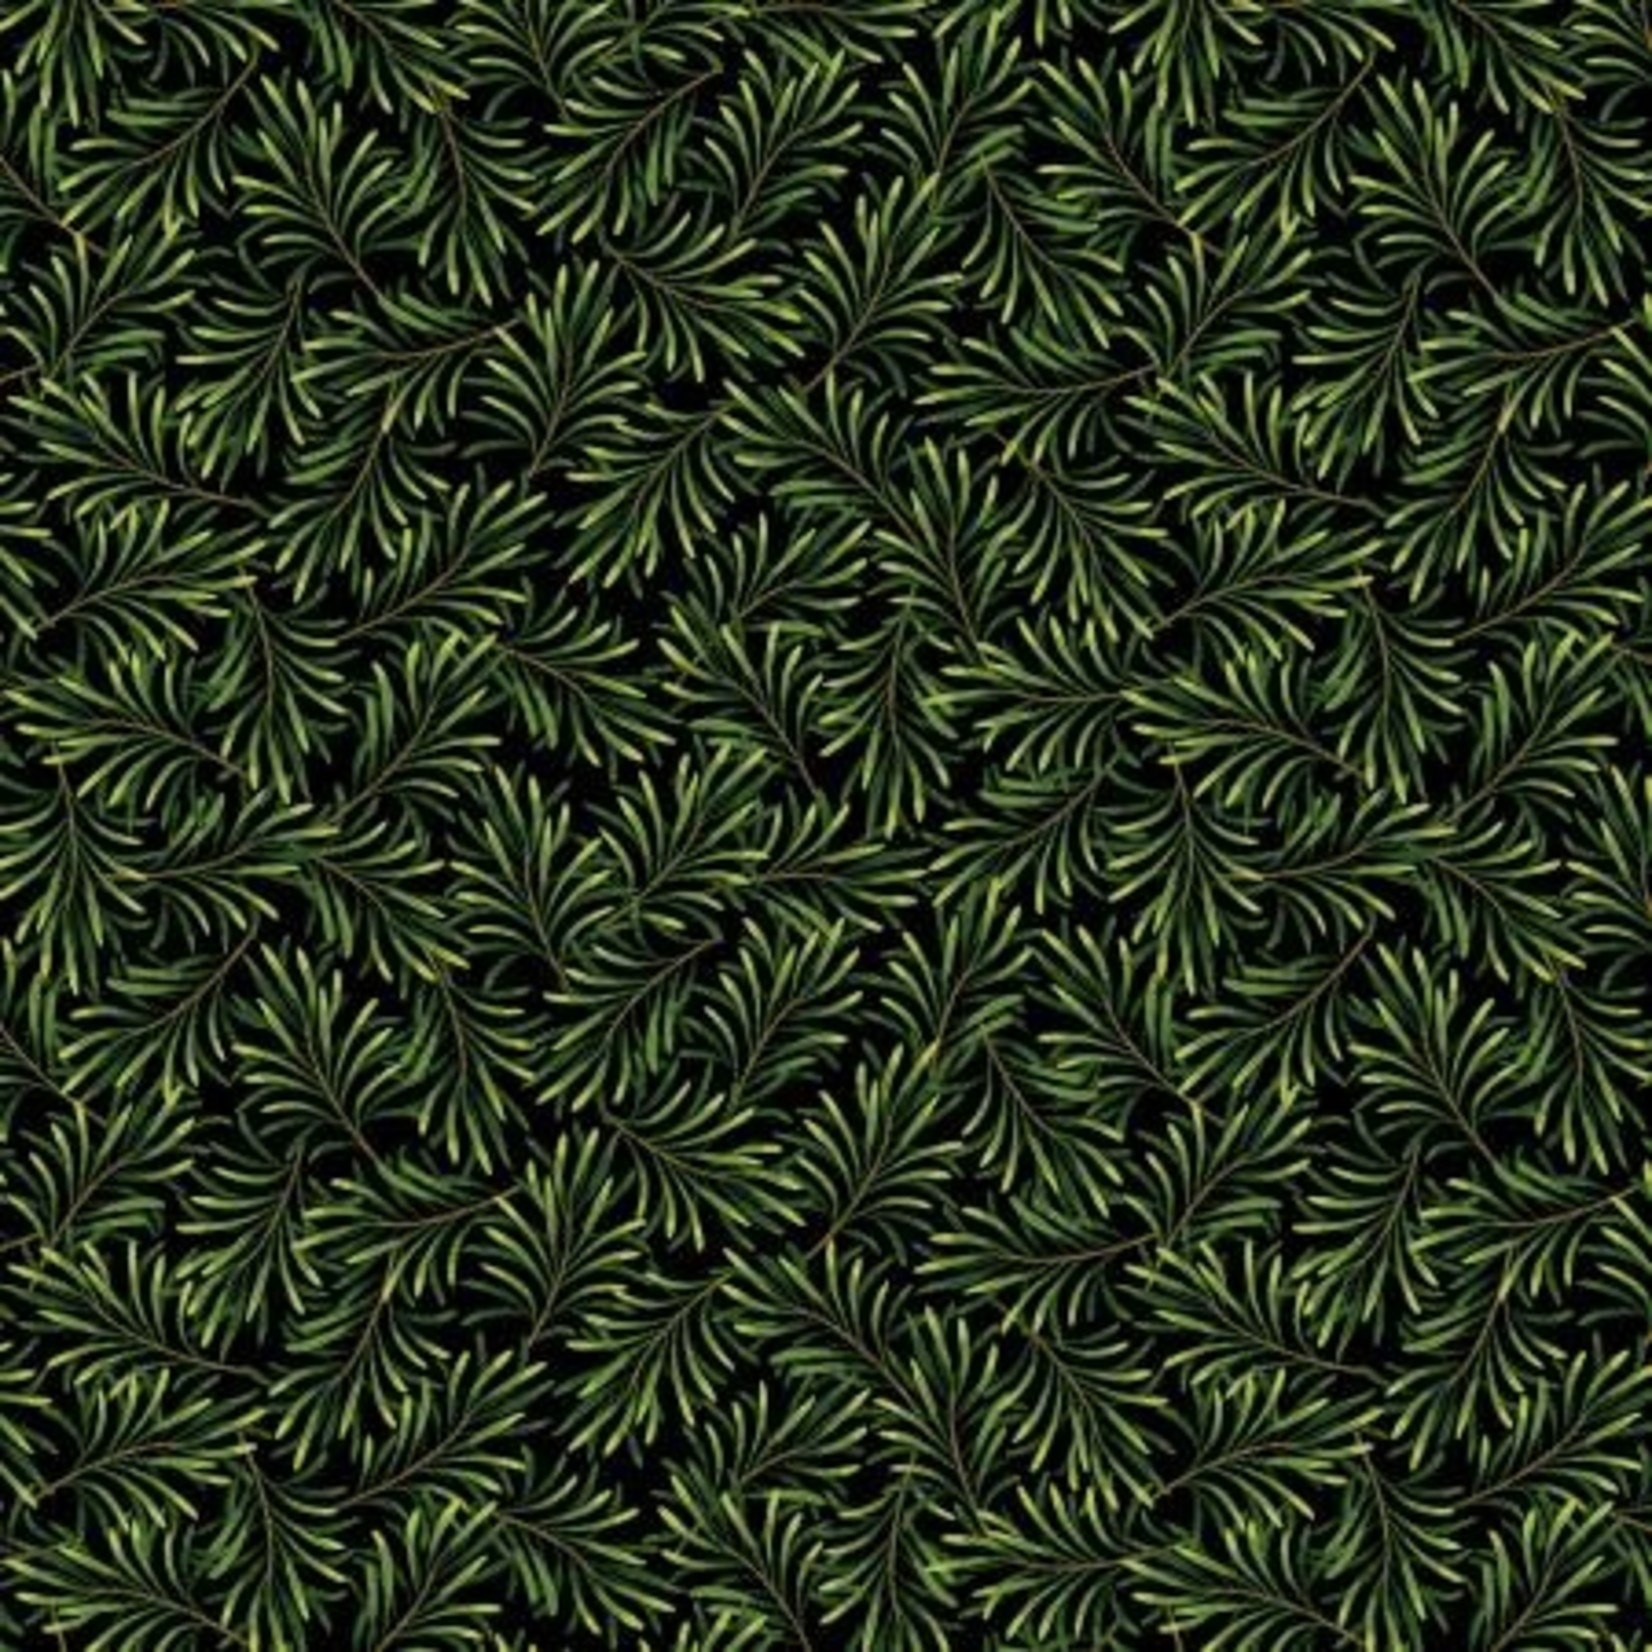 Benartex Studio Boughs of Beauty - Black/Green